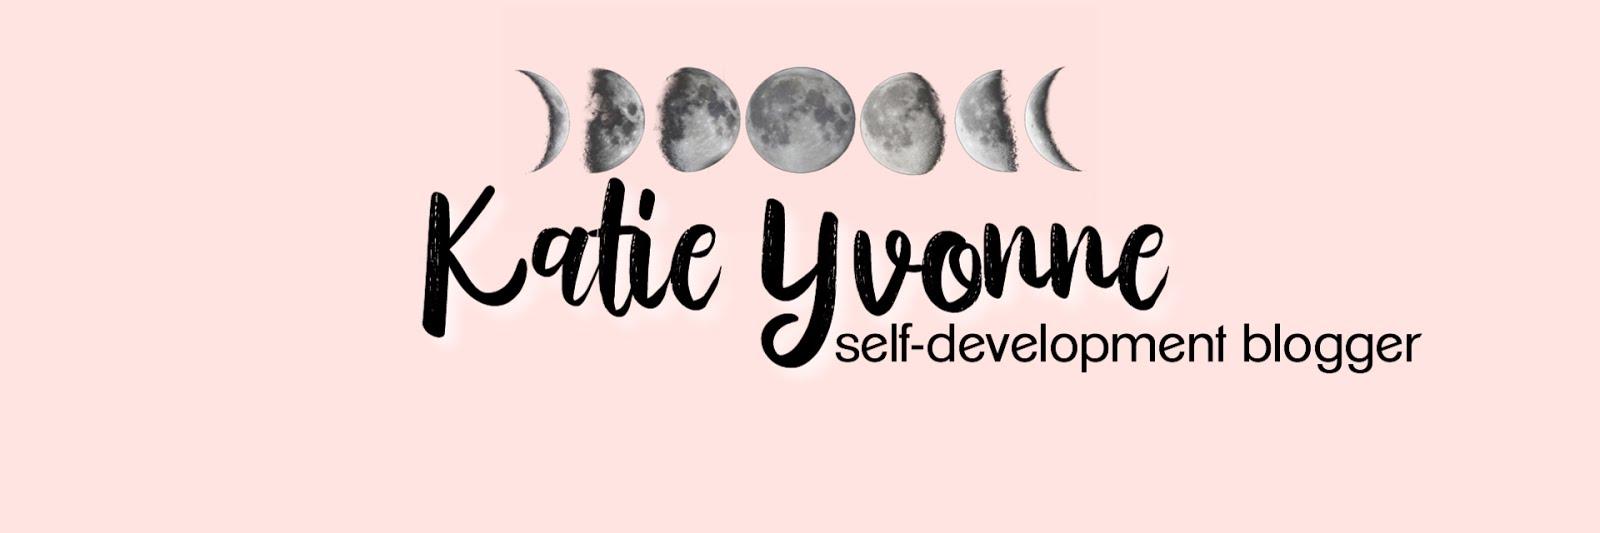 Katie Yvonne